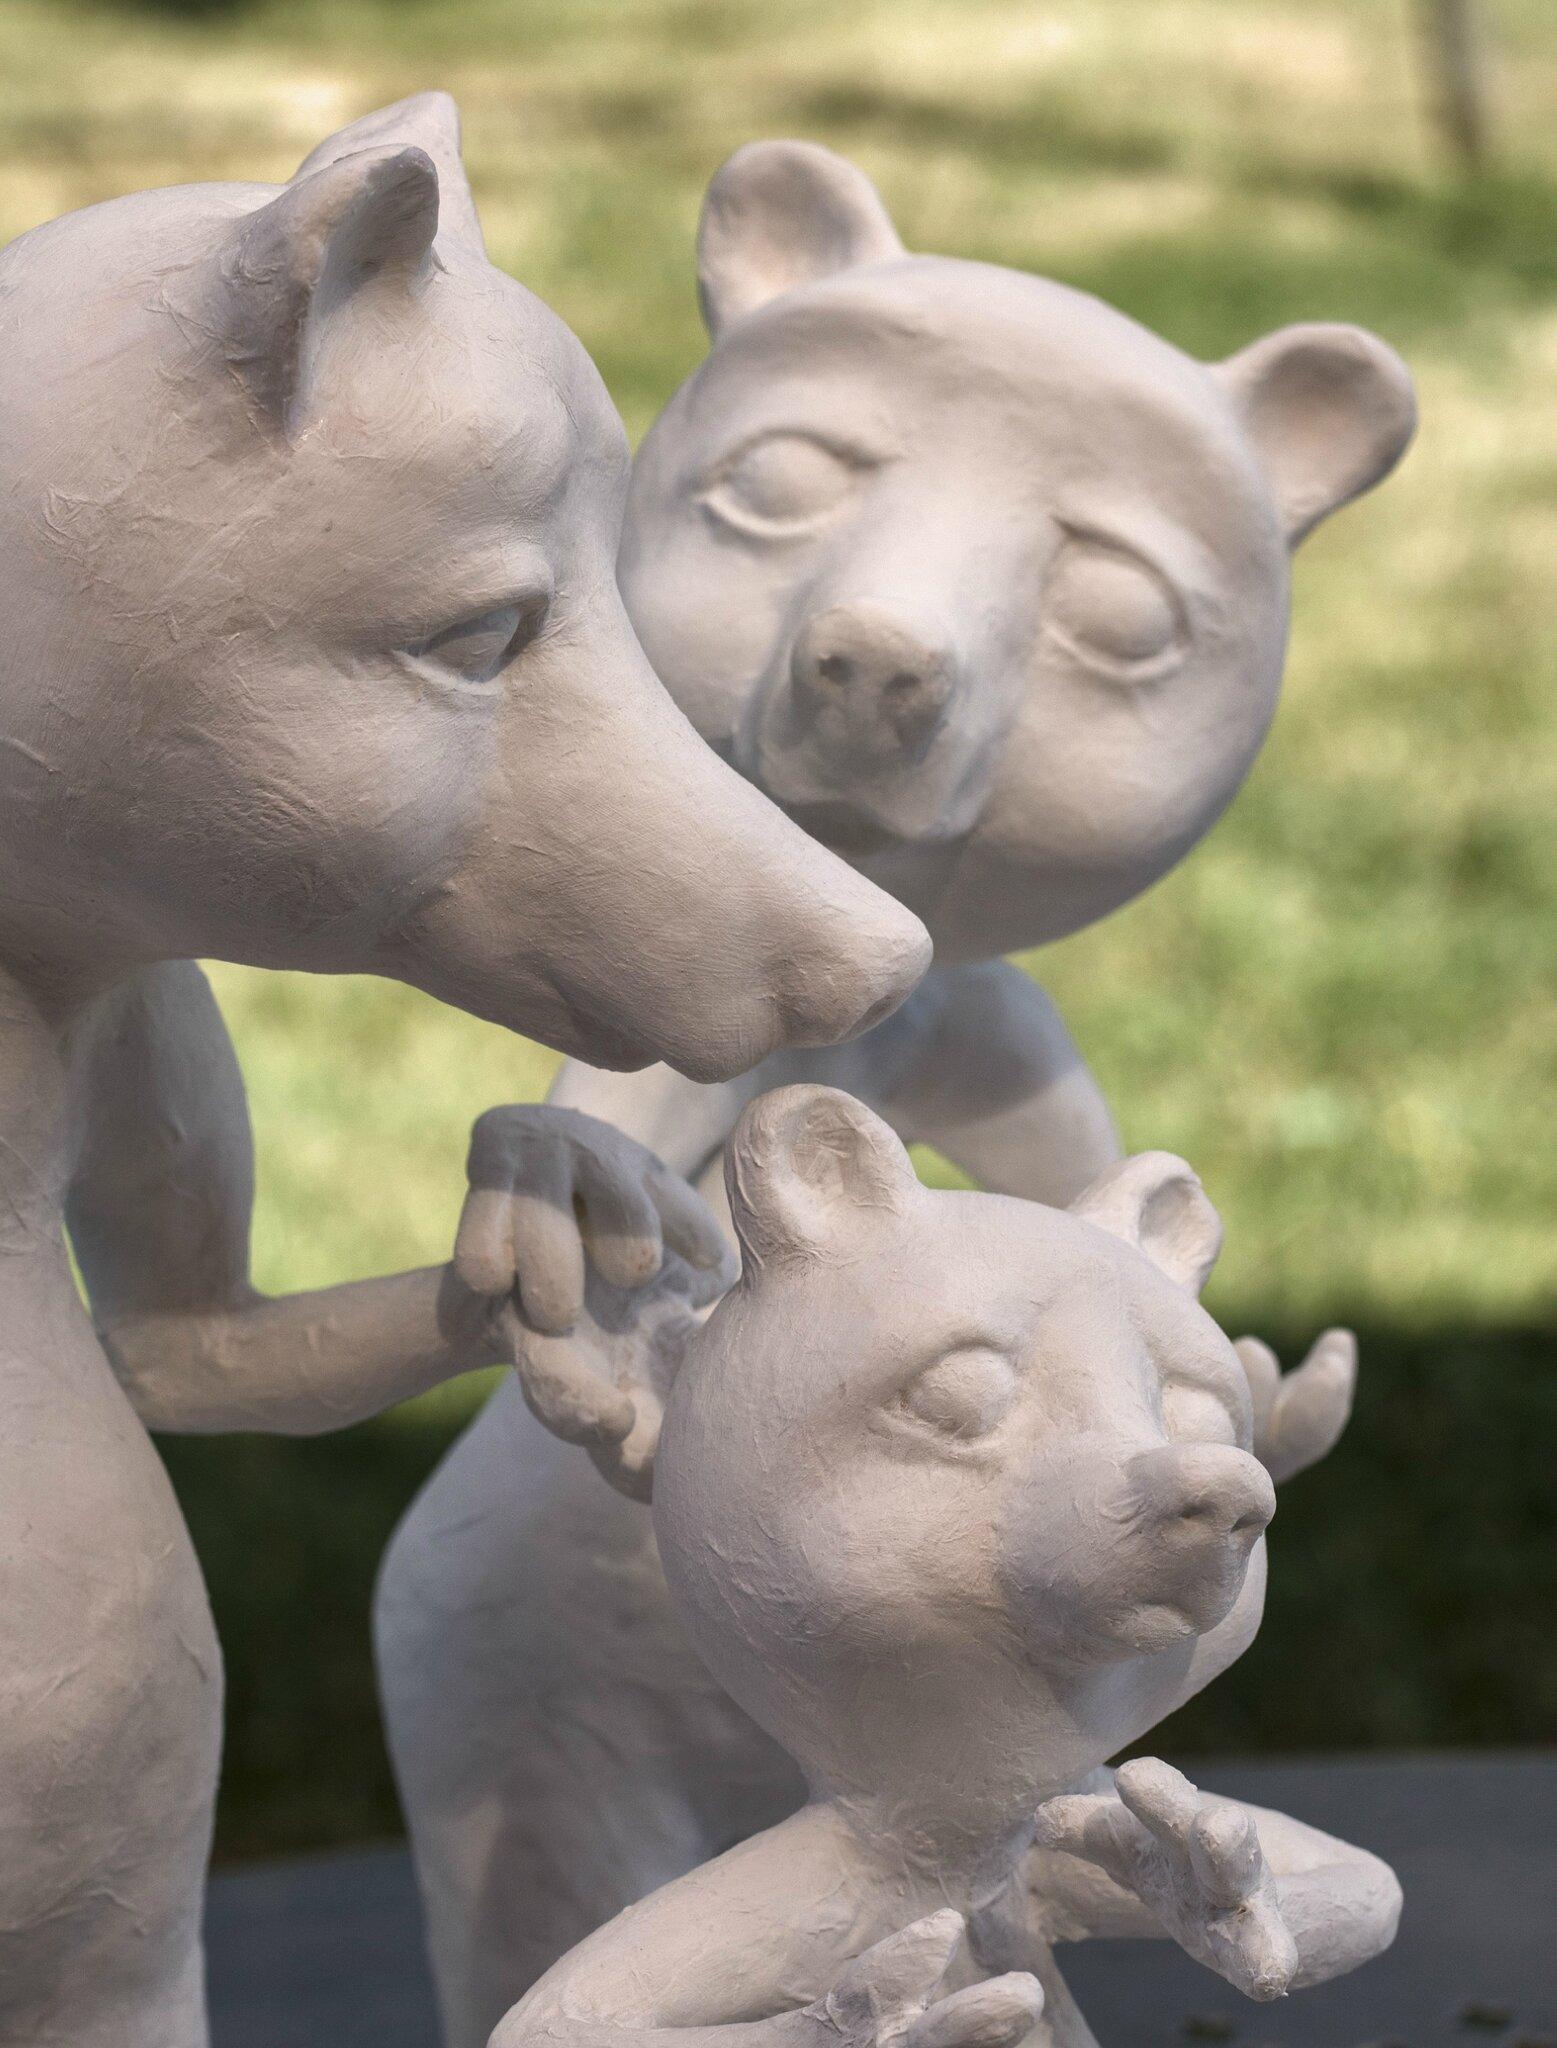 Bears2_papiermache_alinepallaro_2017